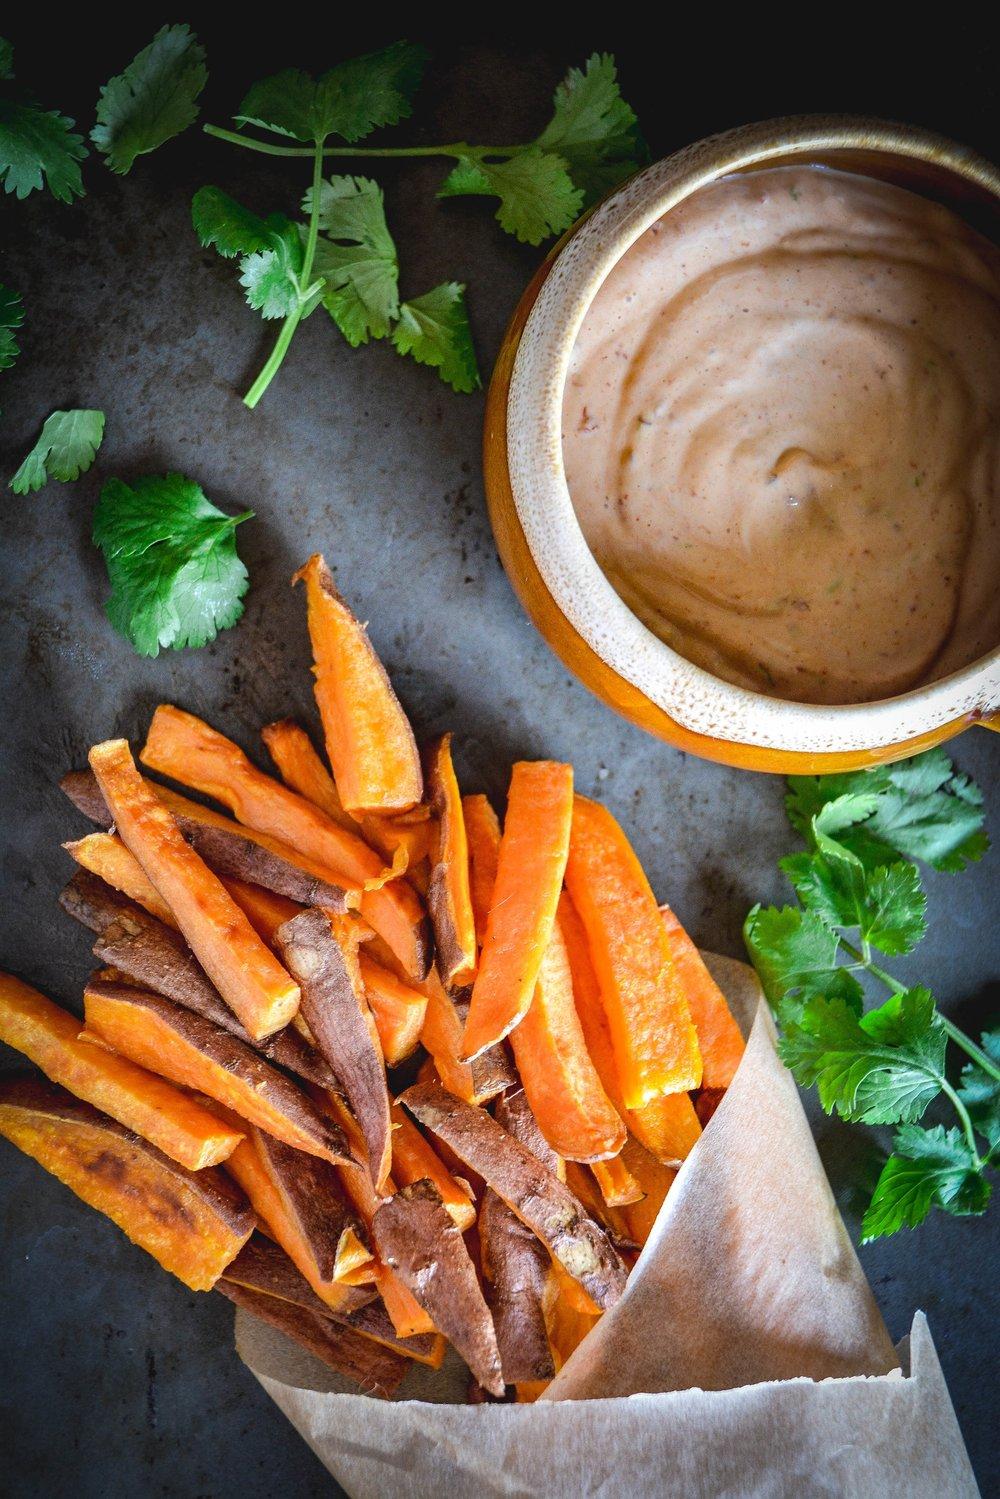 sweet potato fries, mayo and herbs